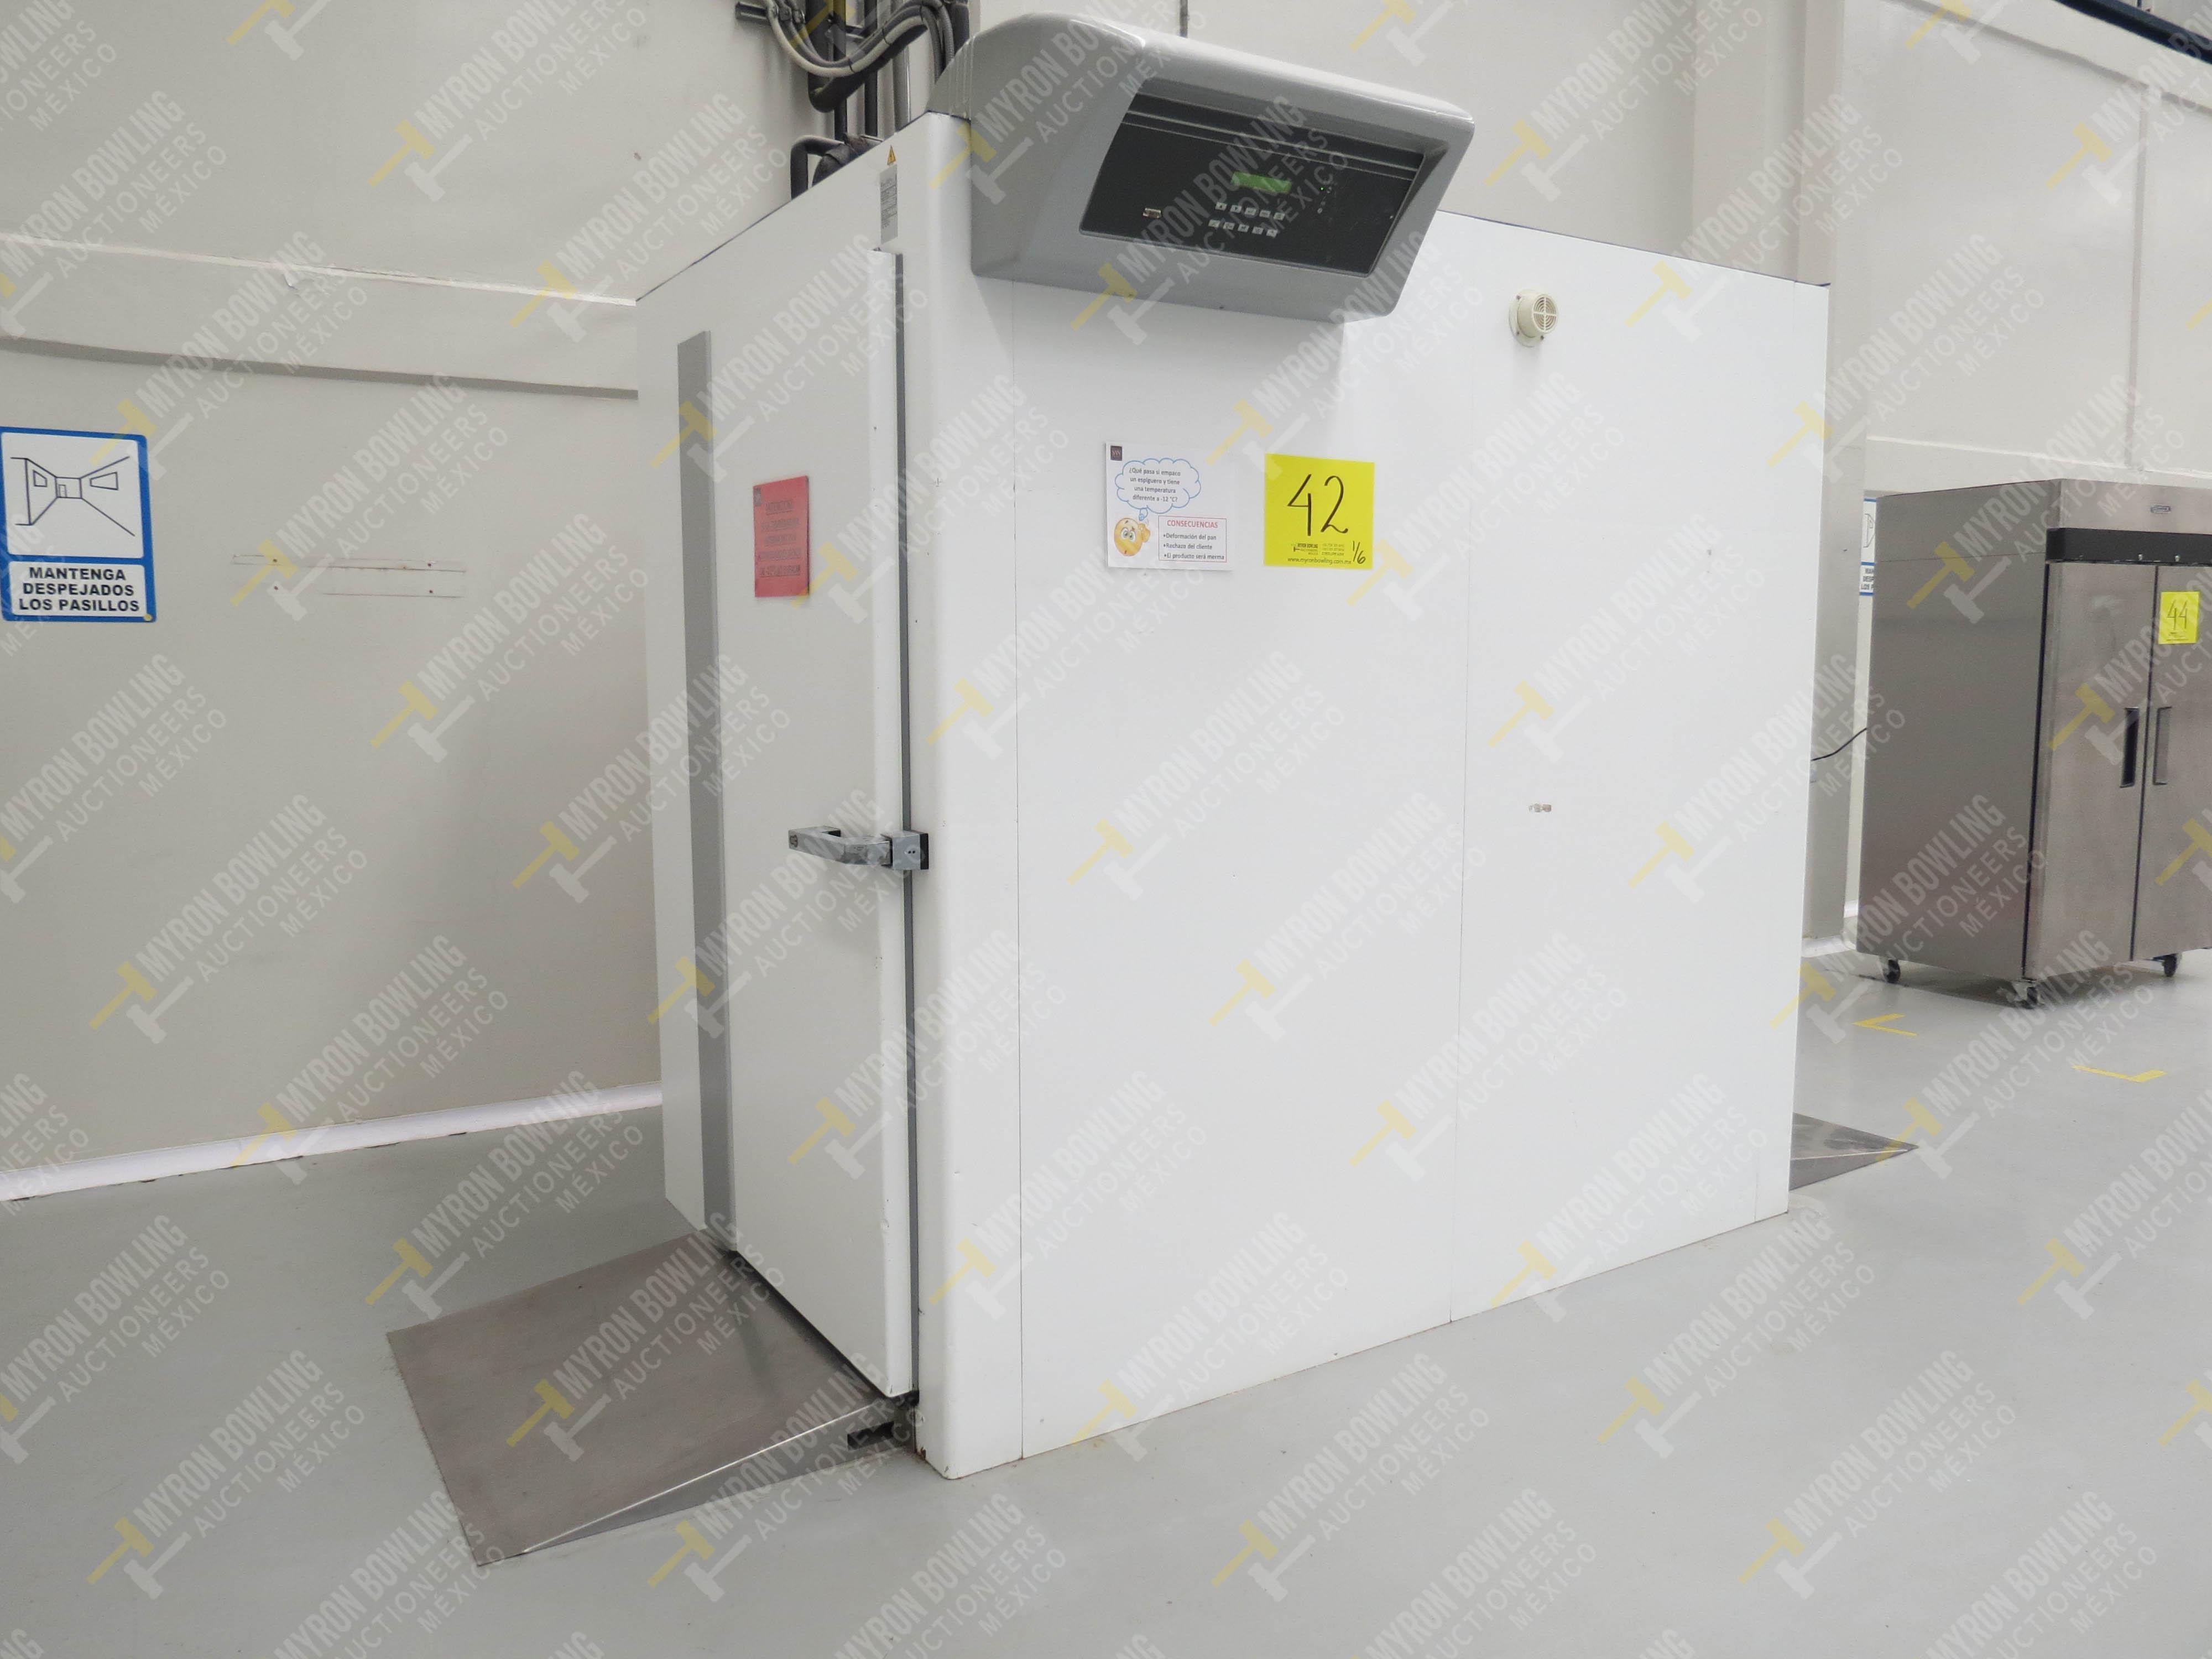 Túnel de congelación de alimentos marca Criocabin, Modelo G130020, No. de Serie 29535666 …